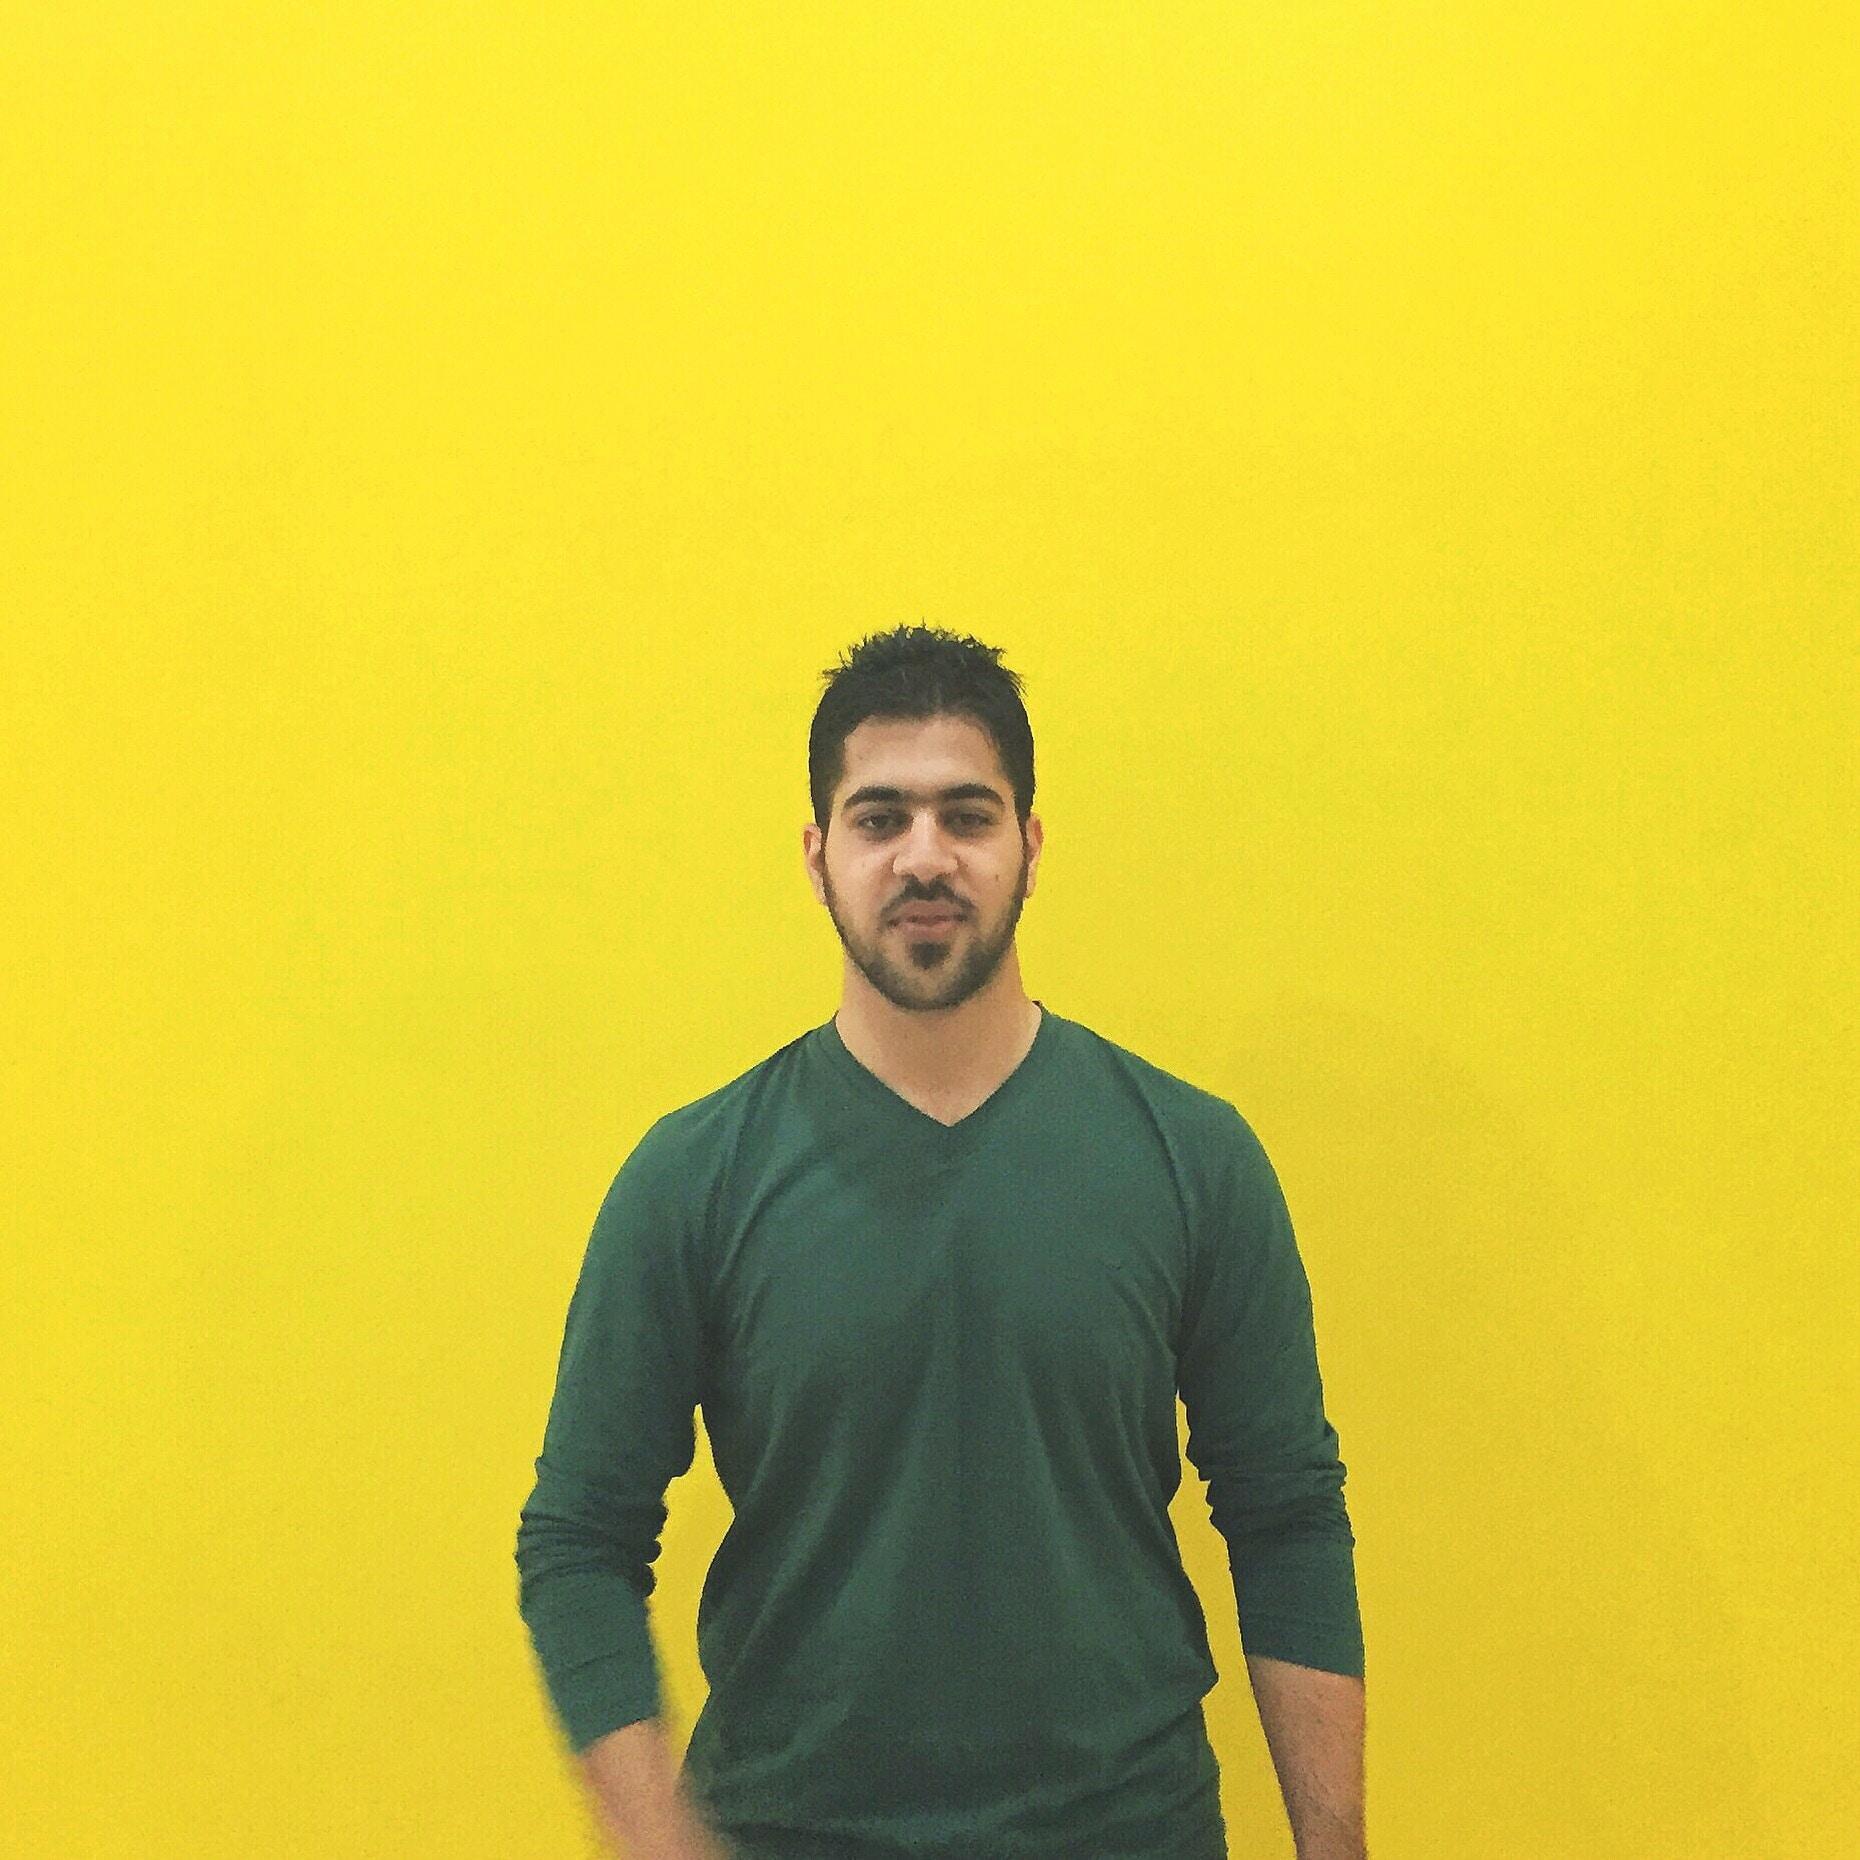 Go to Masoud Mirzamani's profile